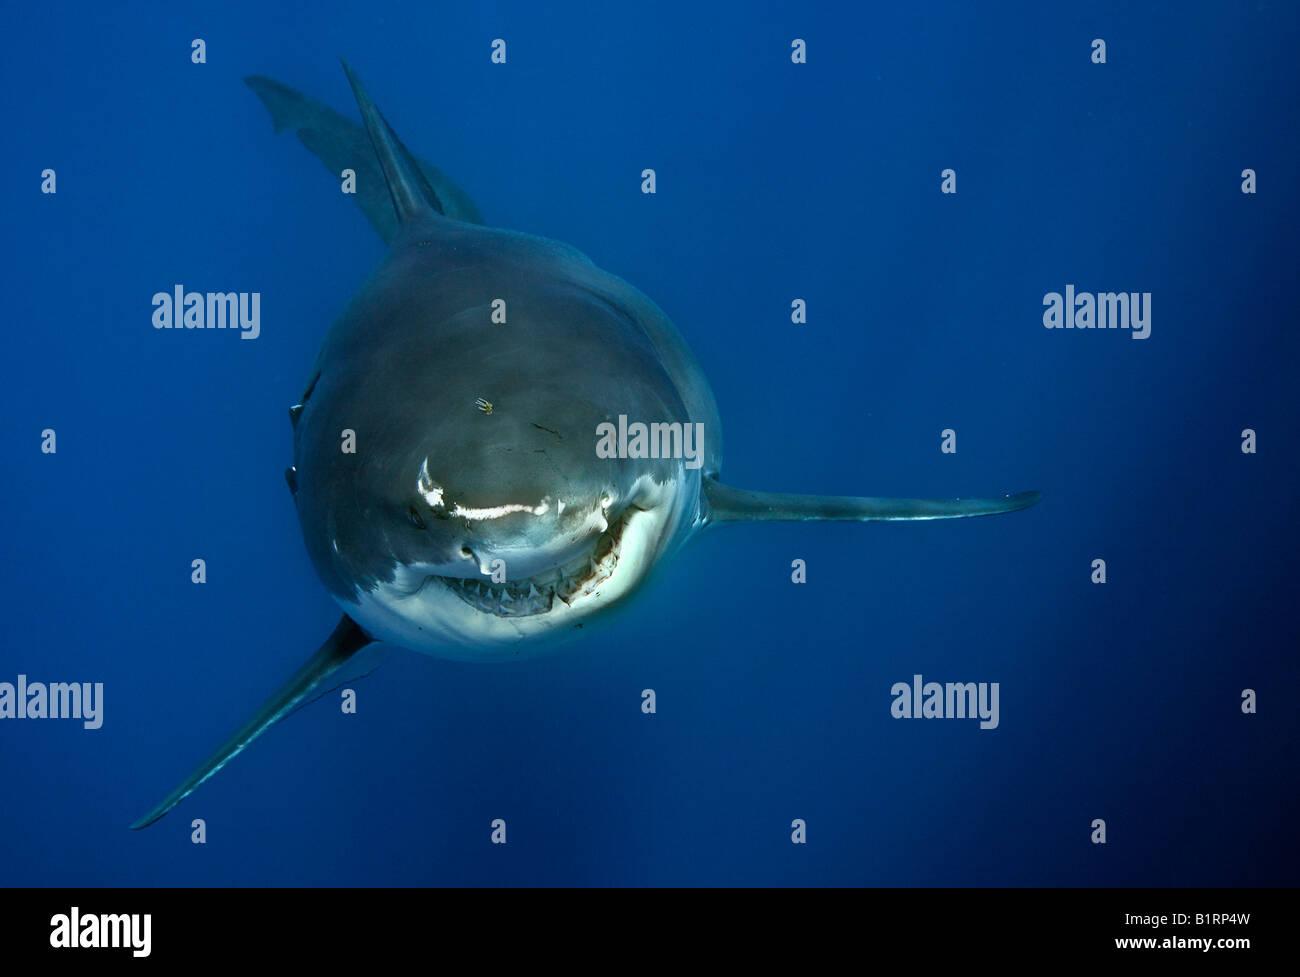 Weißer Hai (Carcharodon Carcharias), Guadalupe Island, Mexiko, Pazifik, Nordamerika Stockbild